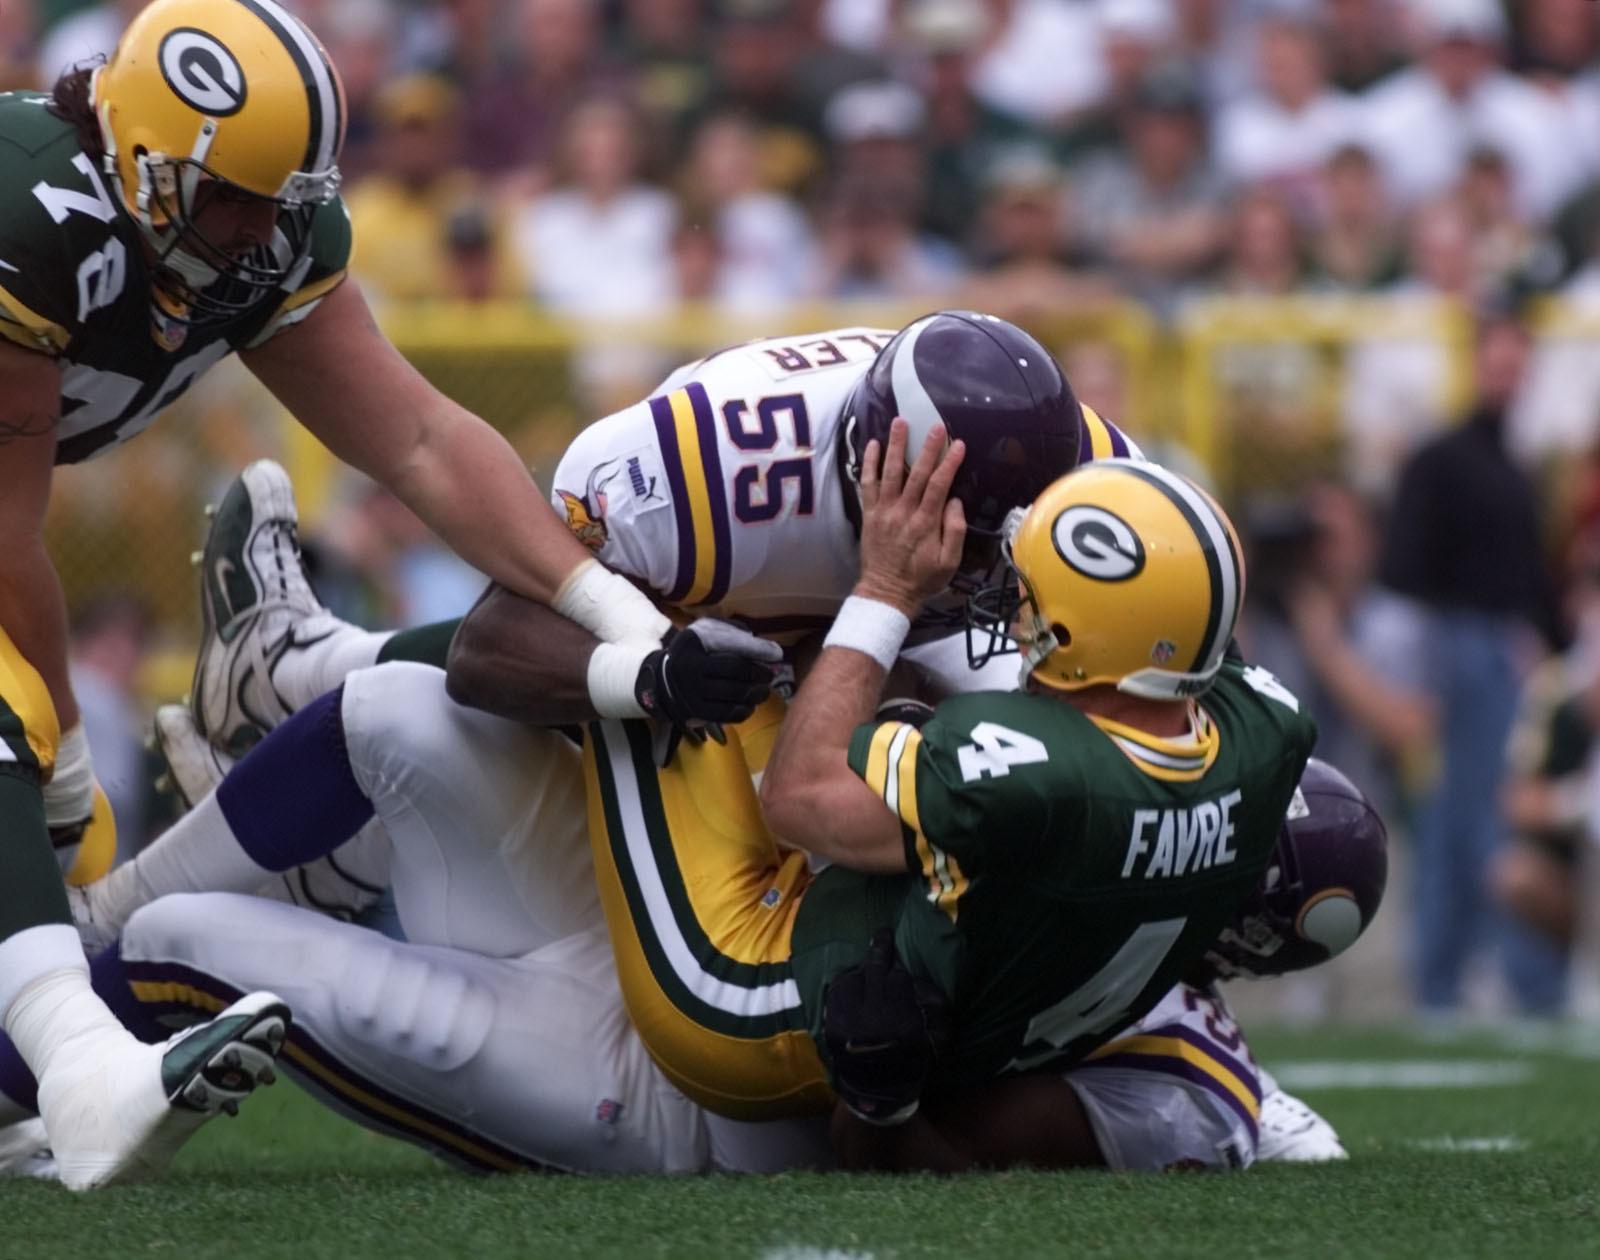 Vikings - Green Bay Packer football September 26,1999. -- Minnesota Vikings linebacker Corey Miller Cleans up on the first Brett Favre, 4, sack forced by Duane Clemons,92, during the 2nd quarter at Lambeau Field in Green Bay.